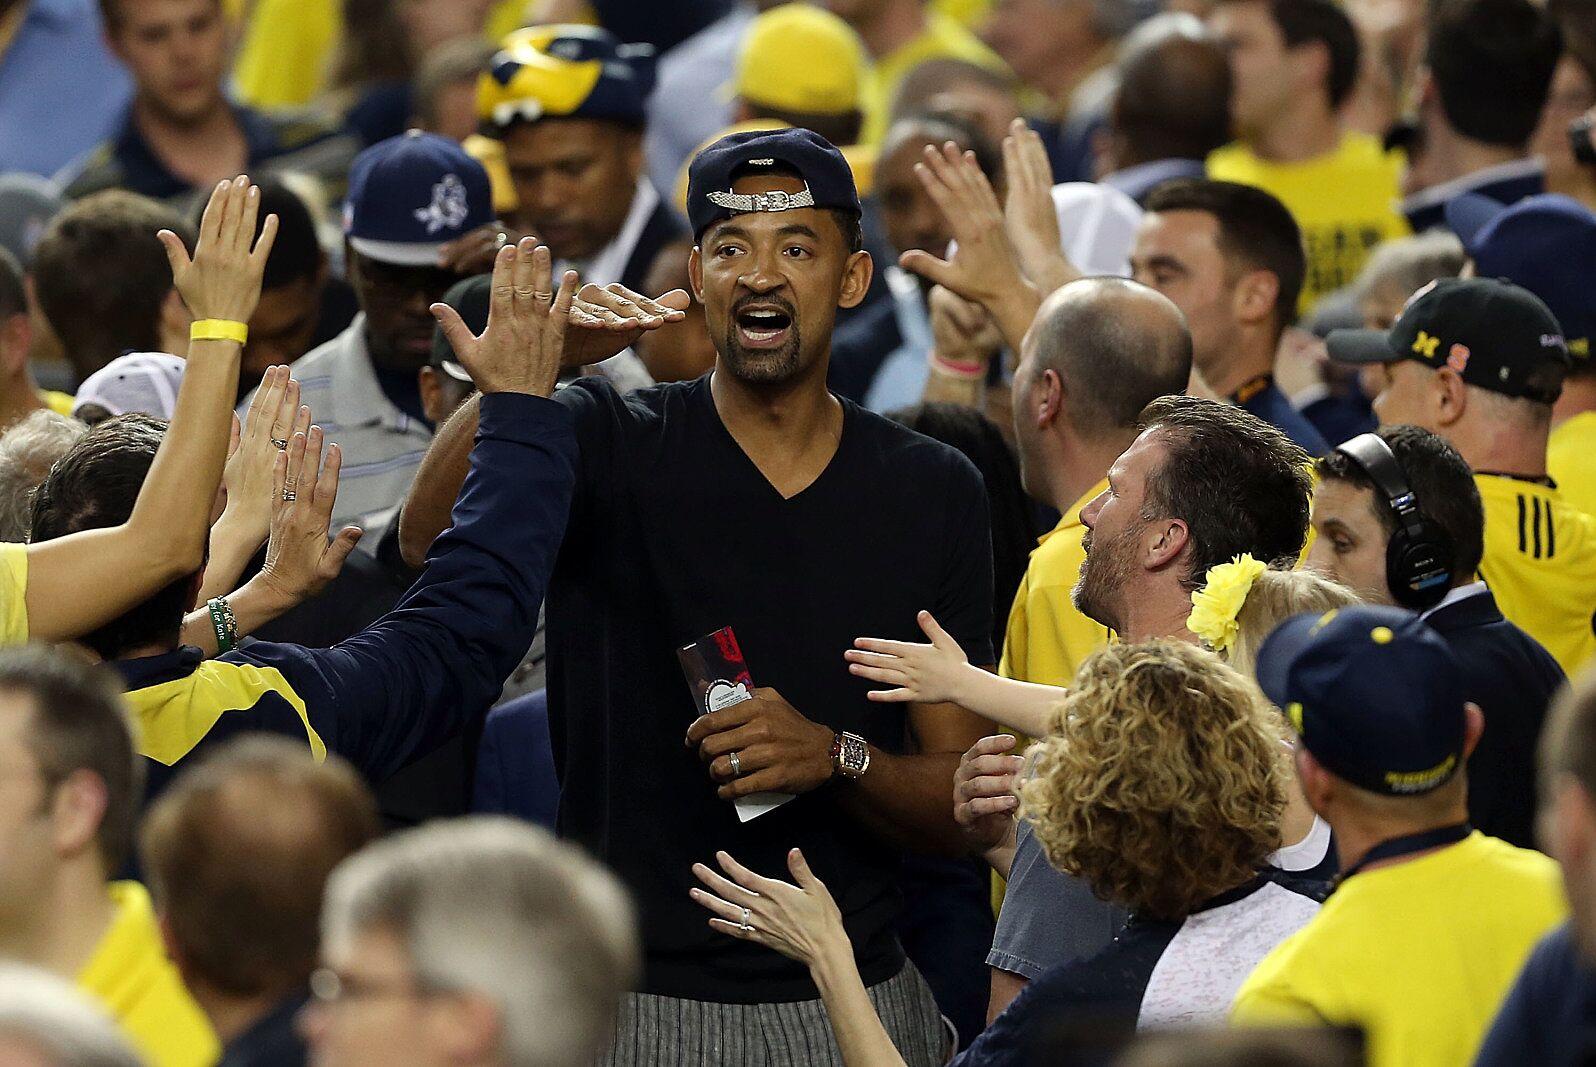 Michigan Basketball: 3 reasons why Wolverines will make 2020 NCAA Tournament